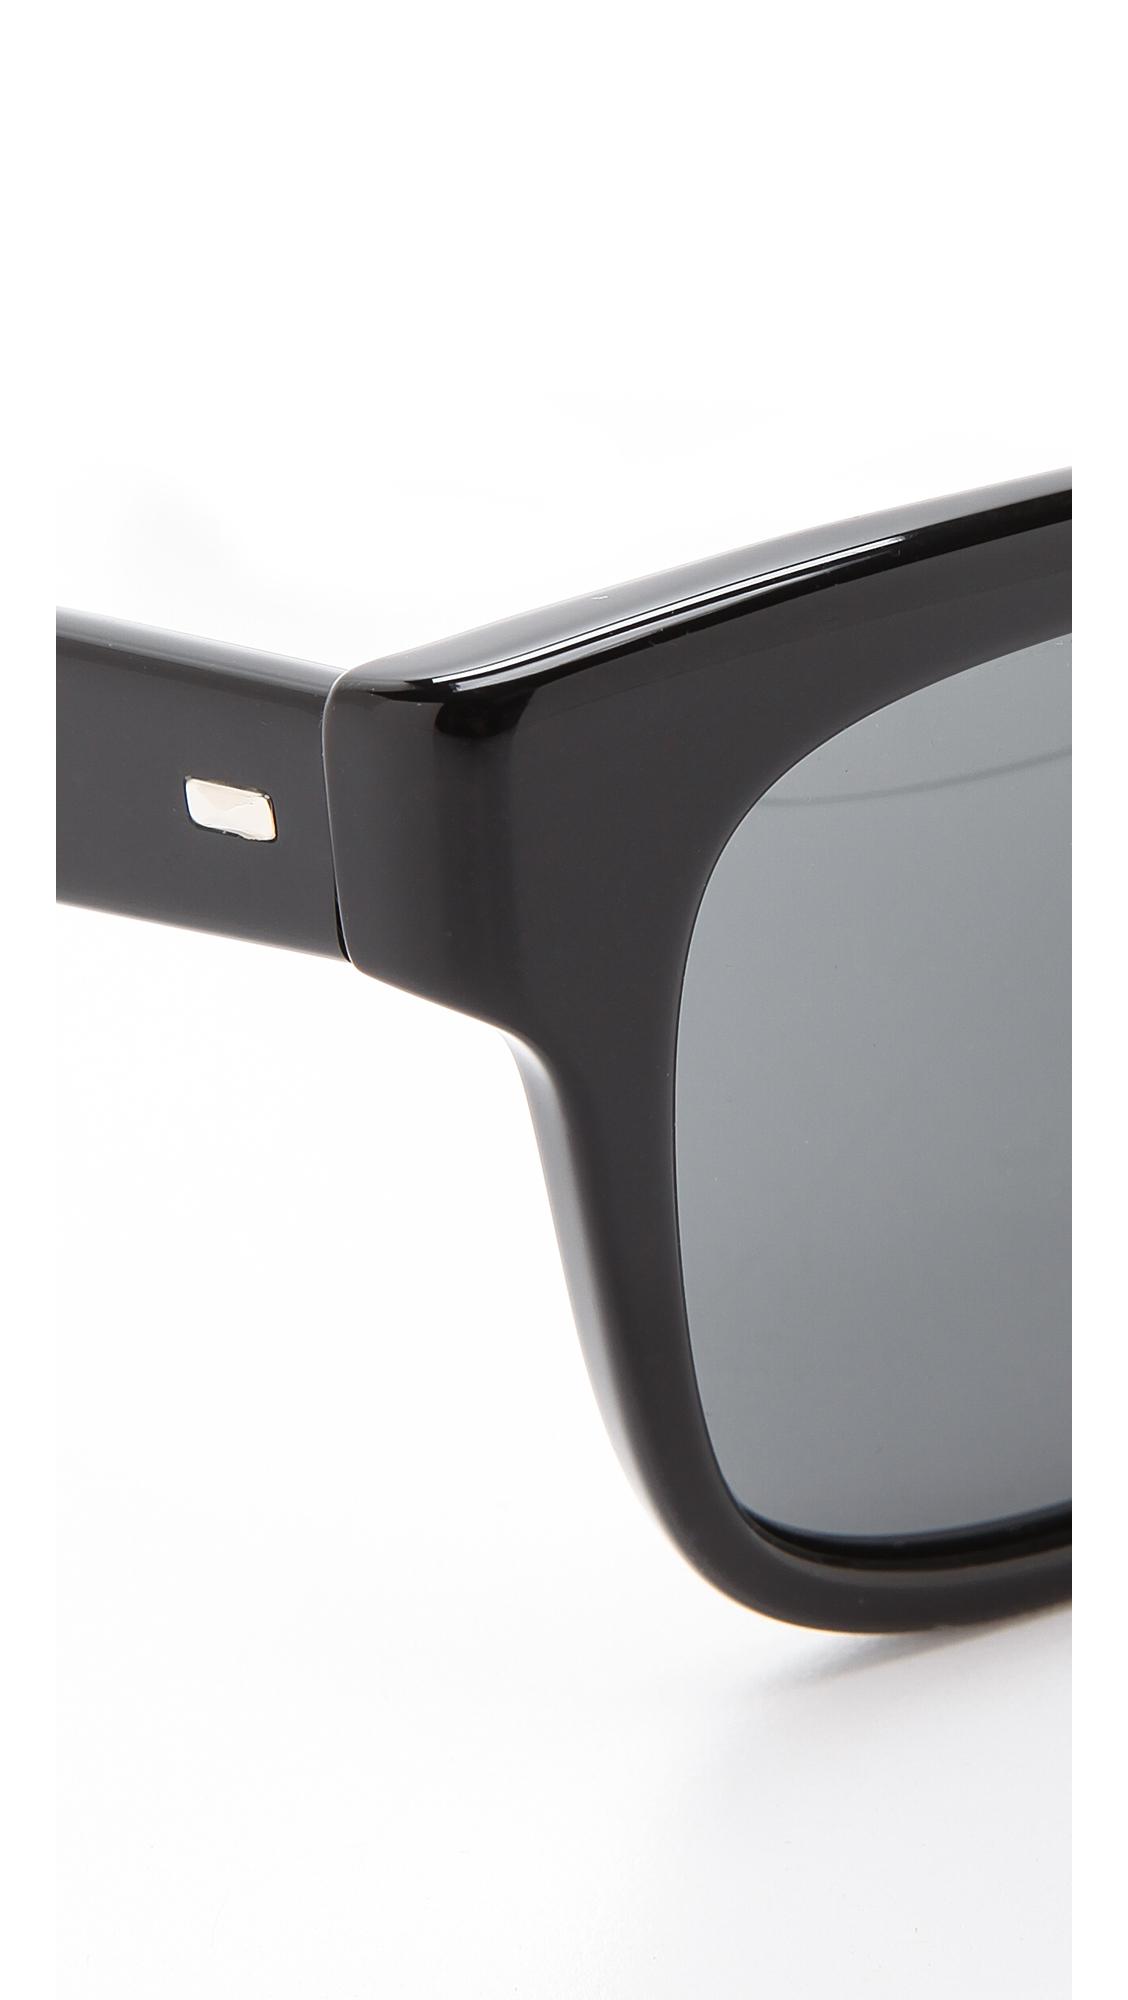 Oliver Peoples Brinley Sunglasses - Henna Gradient/Cordoba in Black/Grey (Black)